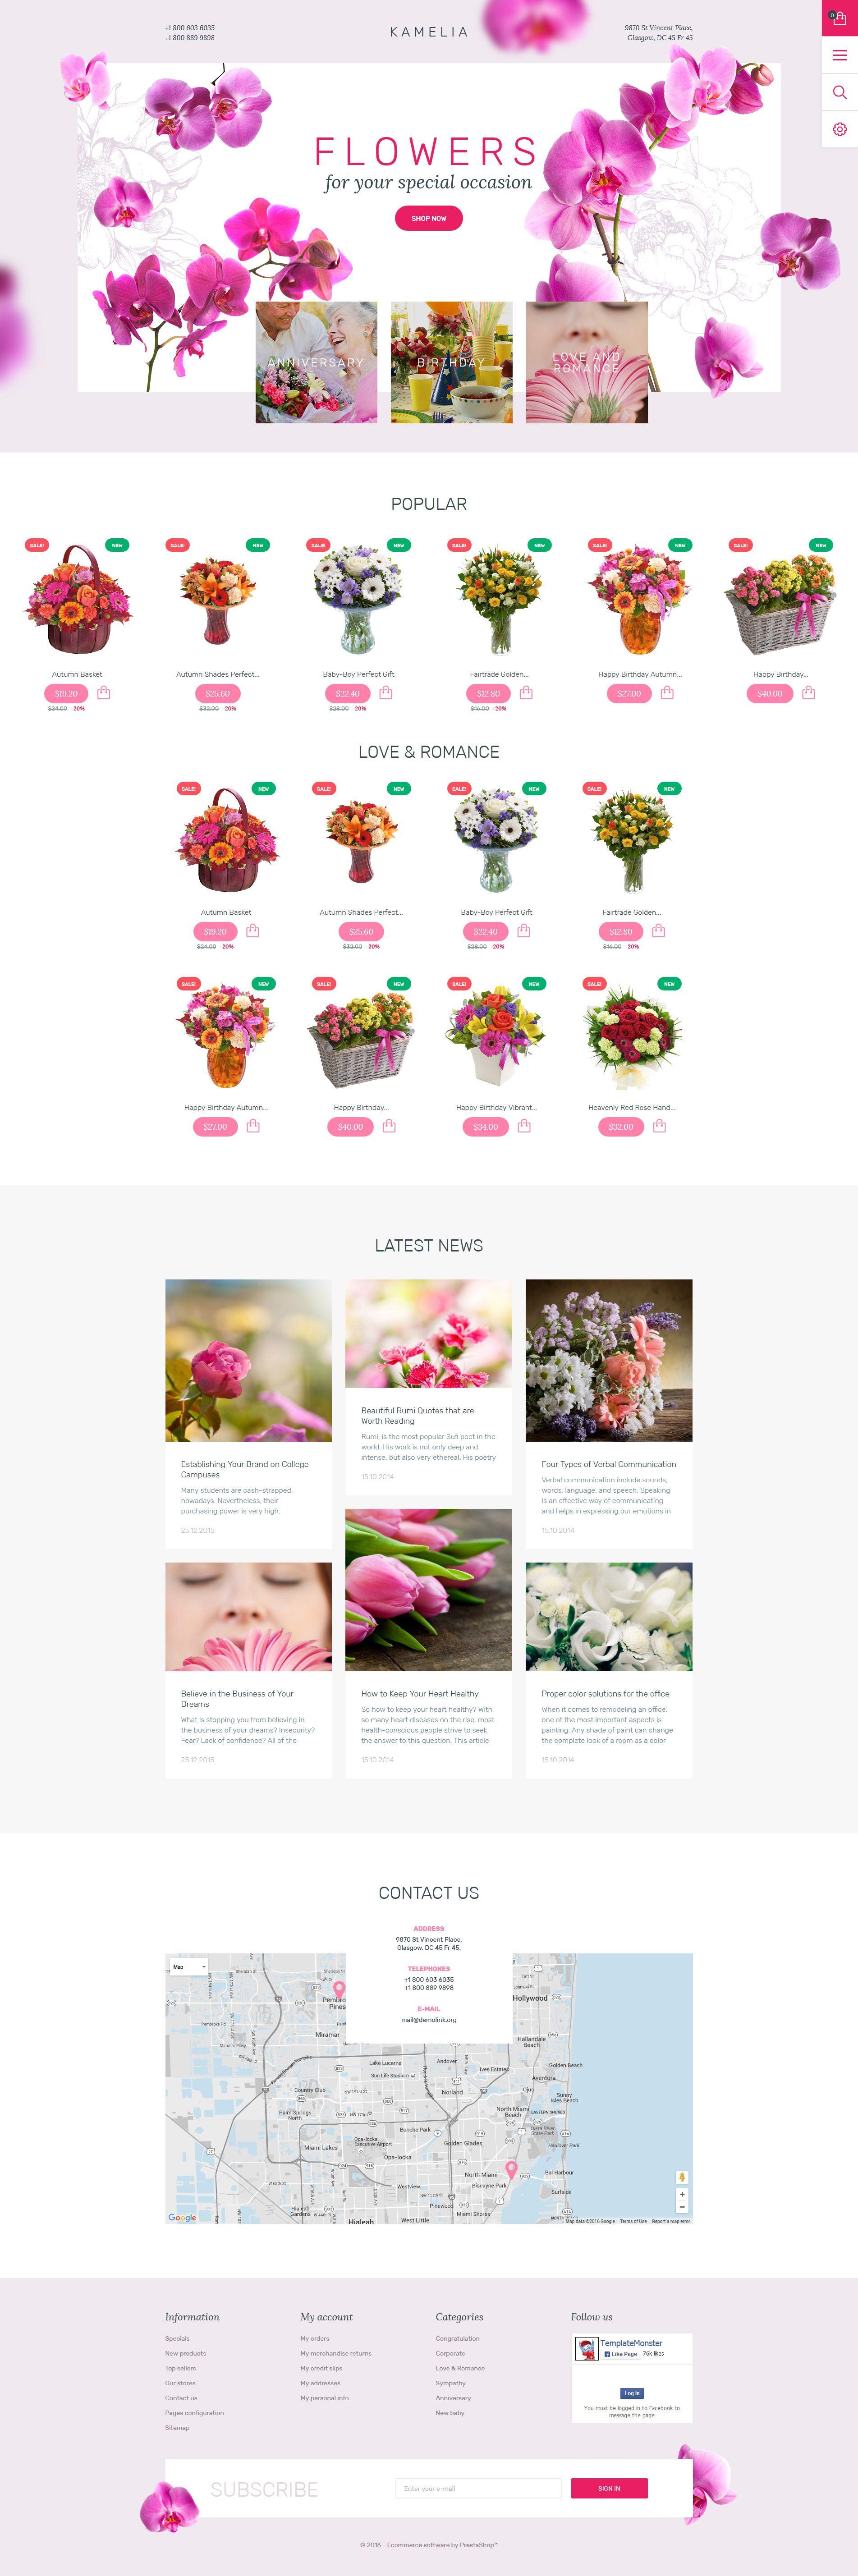 Flowers Theme in 2020 Fun website design